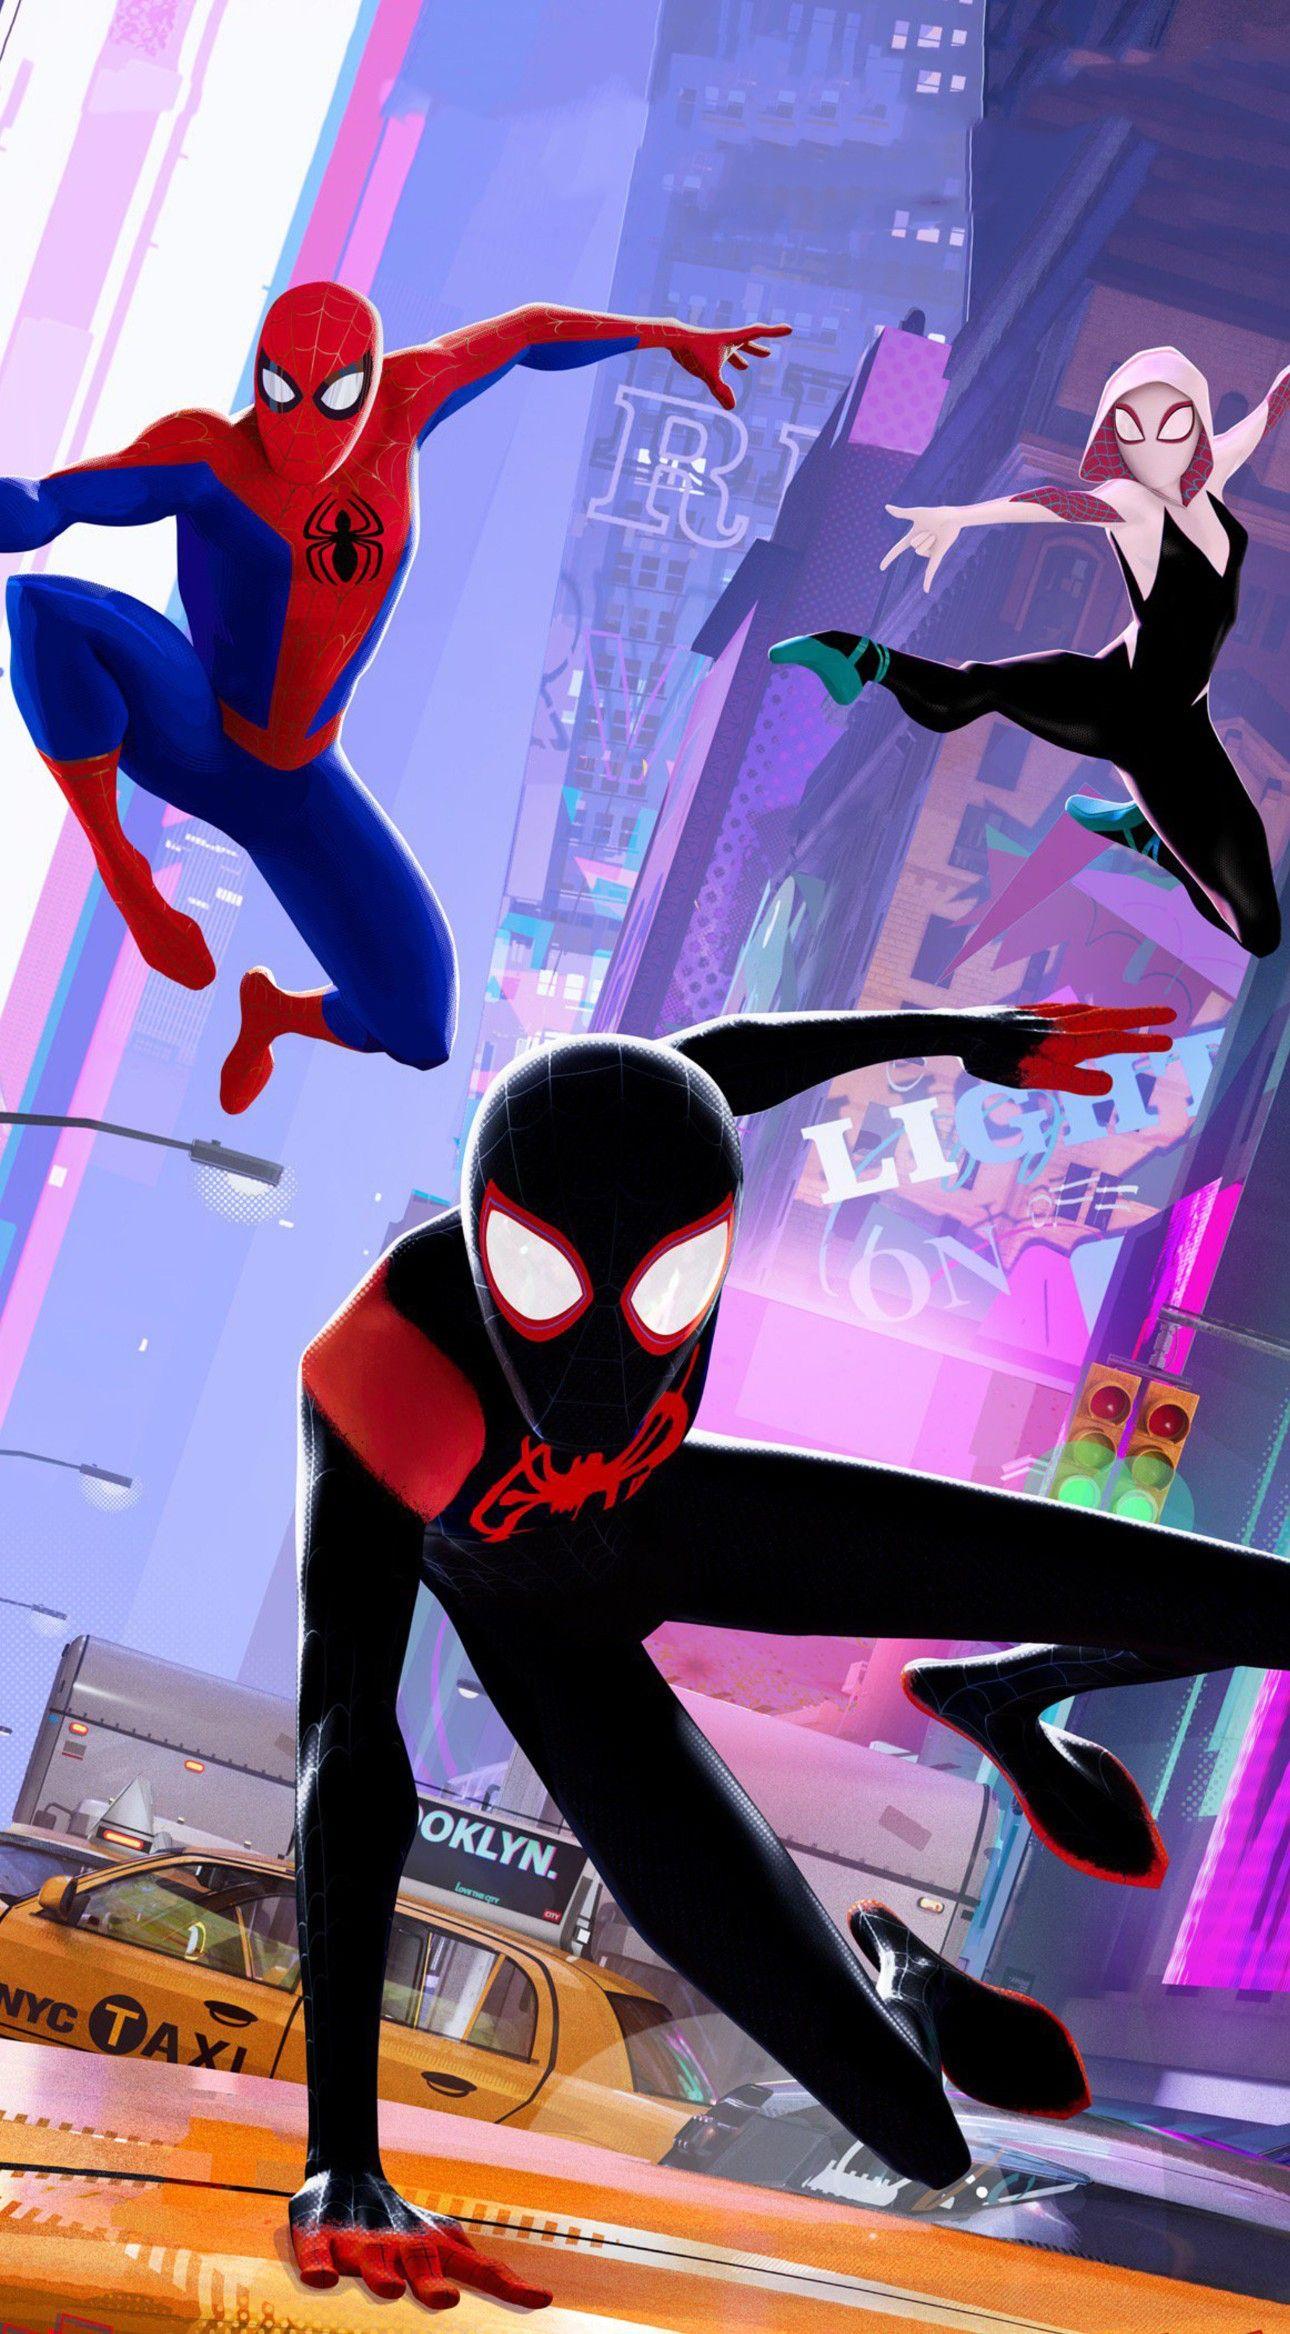 Miles morales the ultimate spider man superhero manga